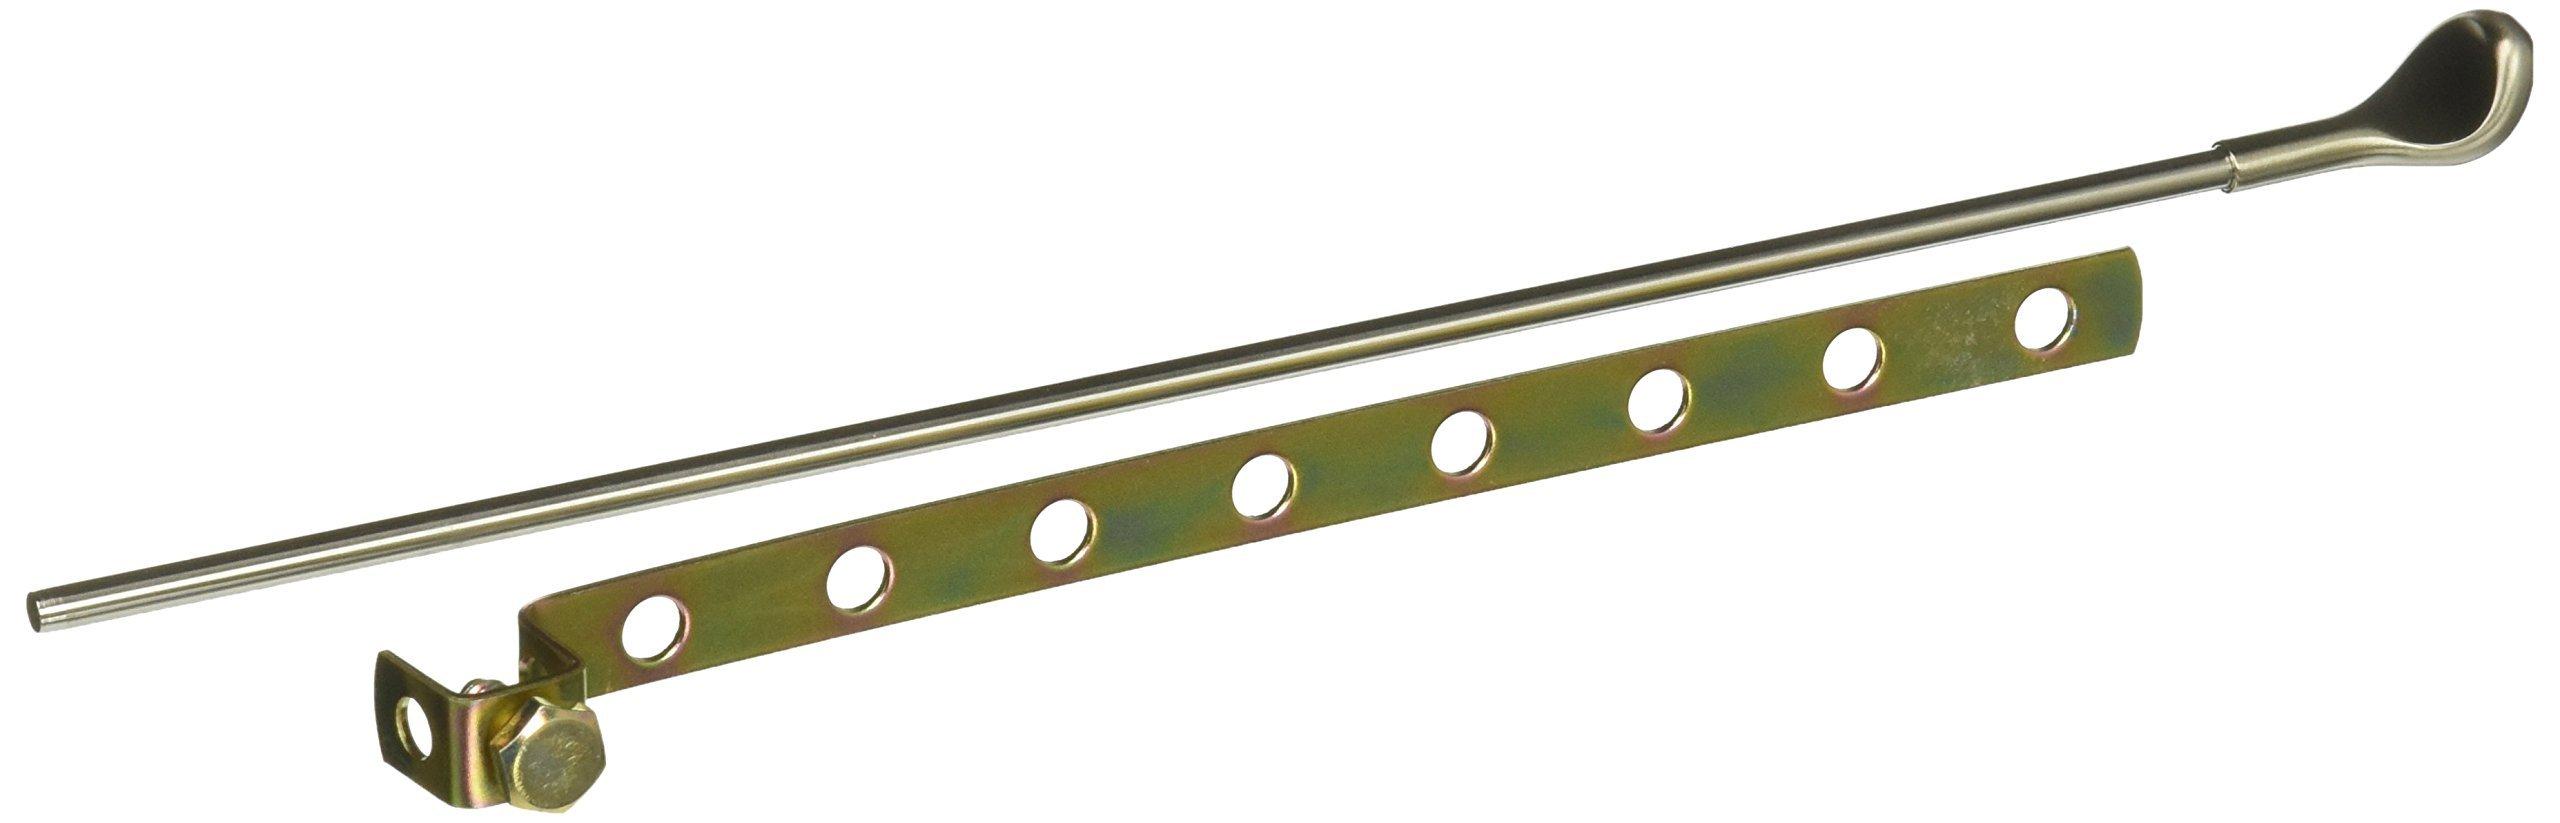 Moen 128865BN Lift Rod Kit, Brushed Nickel by Moen